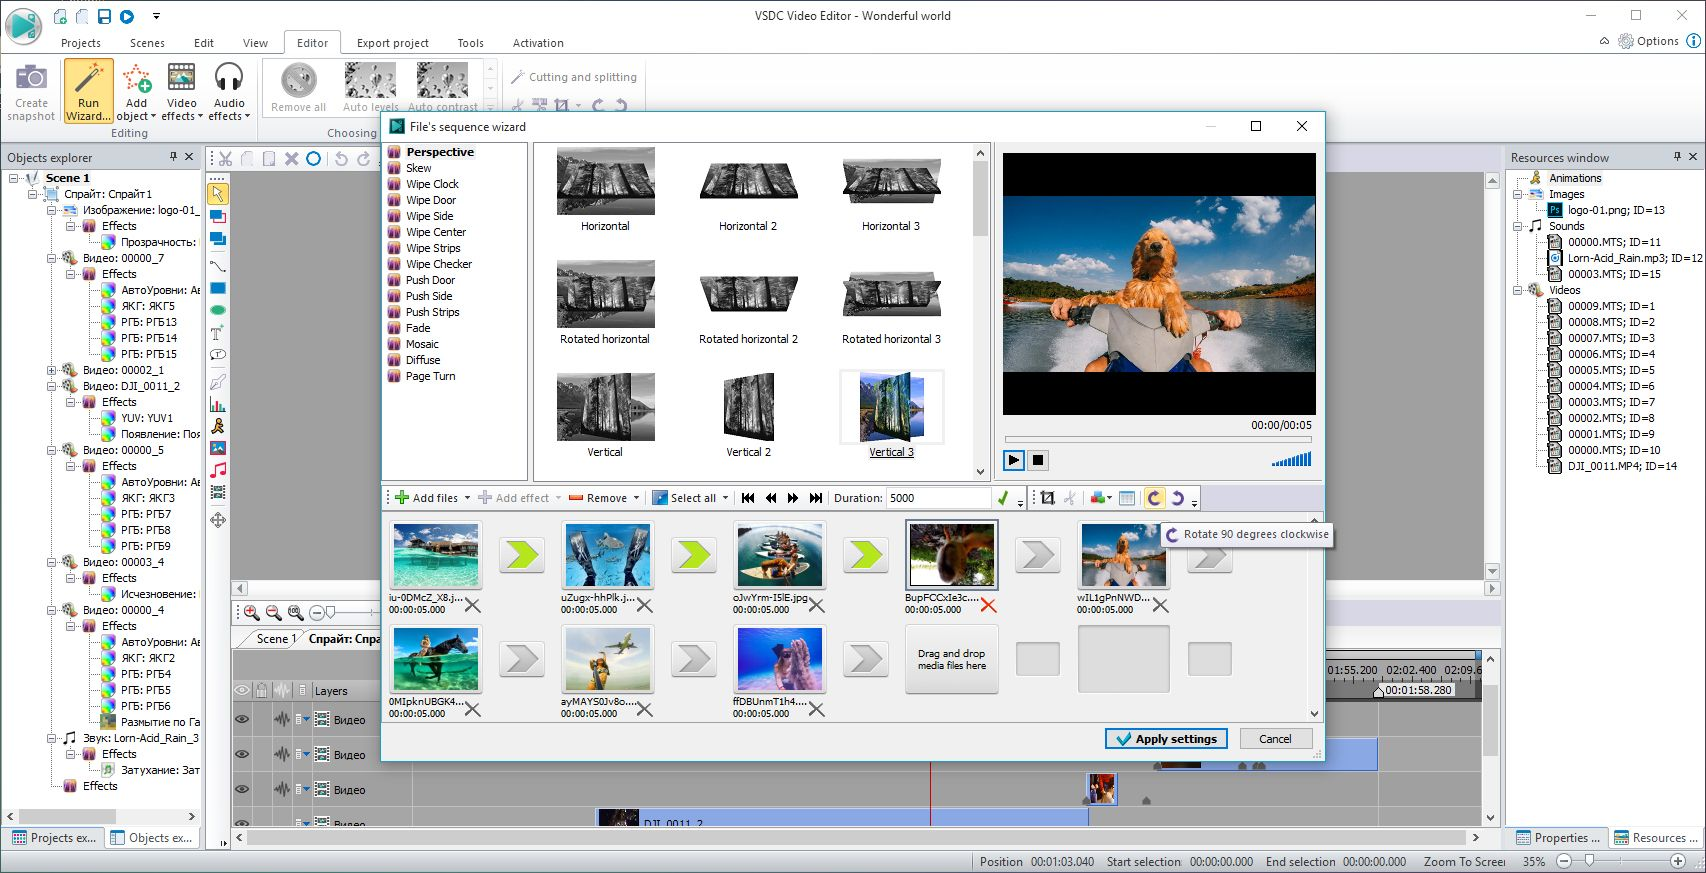 vsdc free video editor1